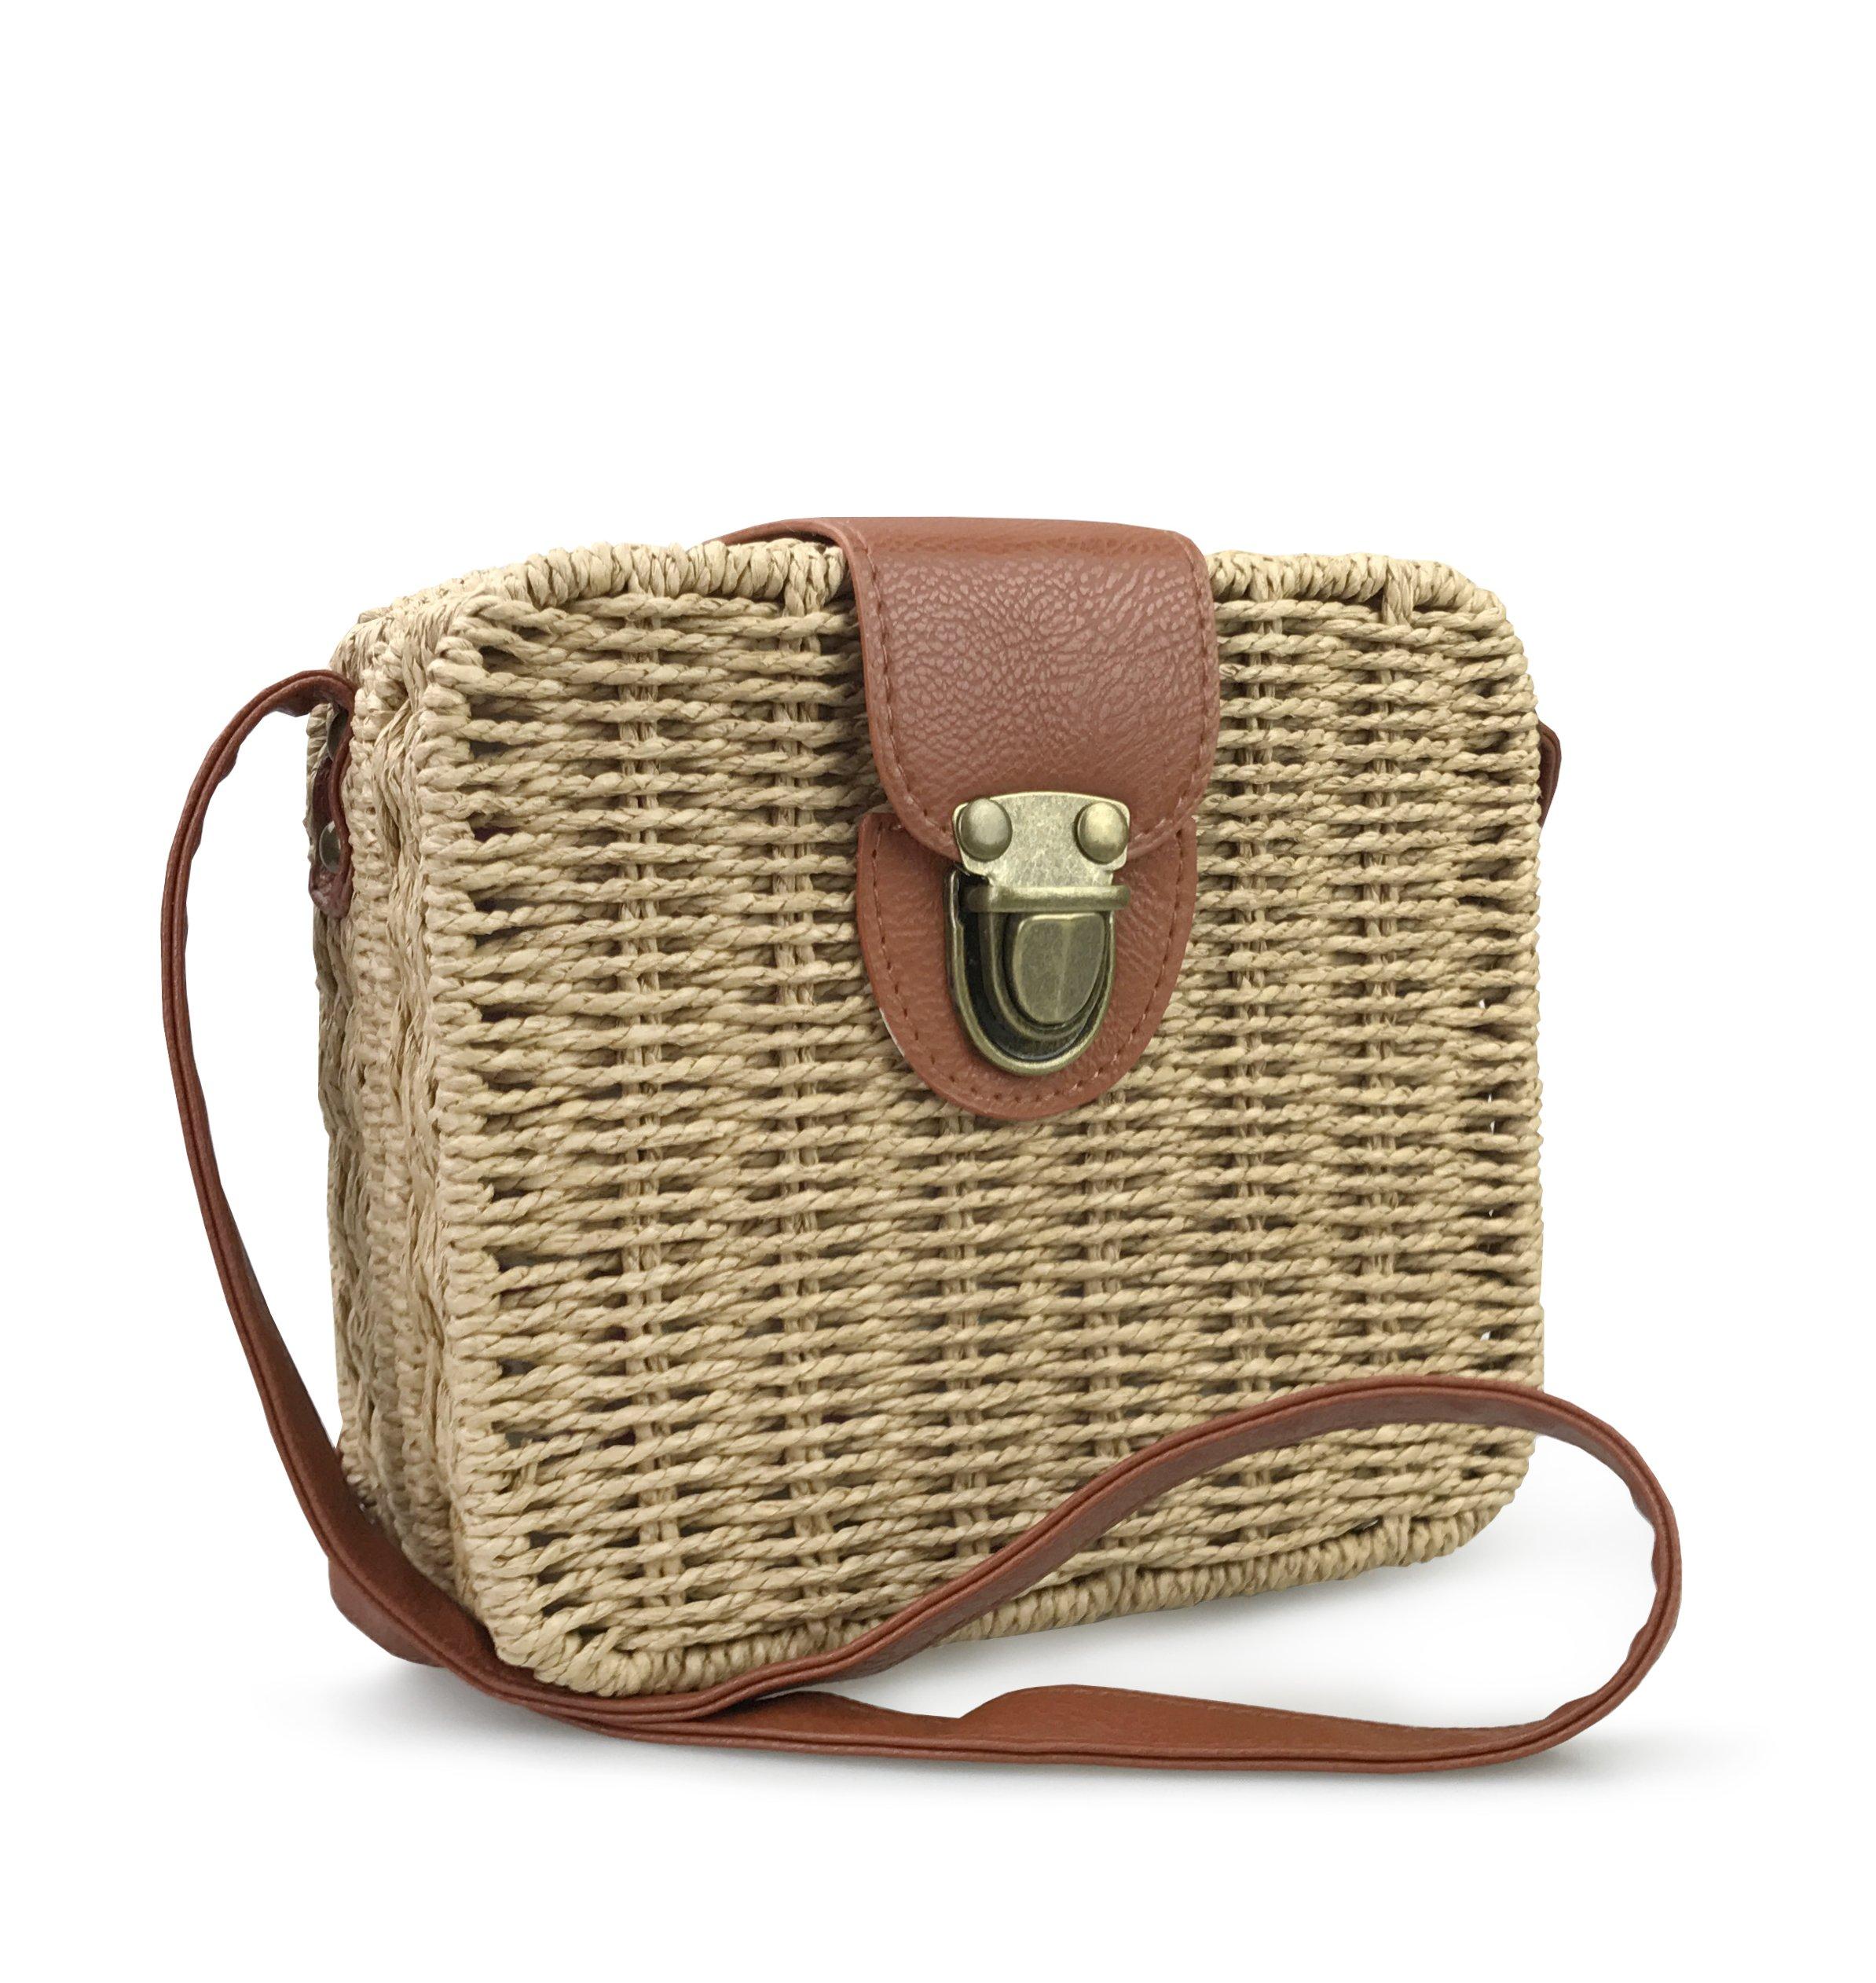 Hoxis Retro Straw Portable Small Case Womens Cross Body Bag Shoulder Messenger Satchel (Brown)